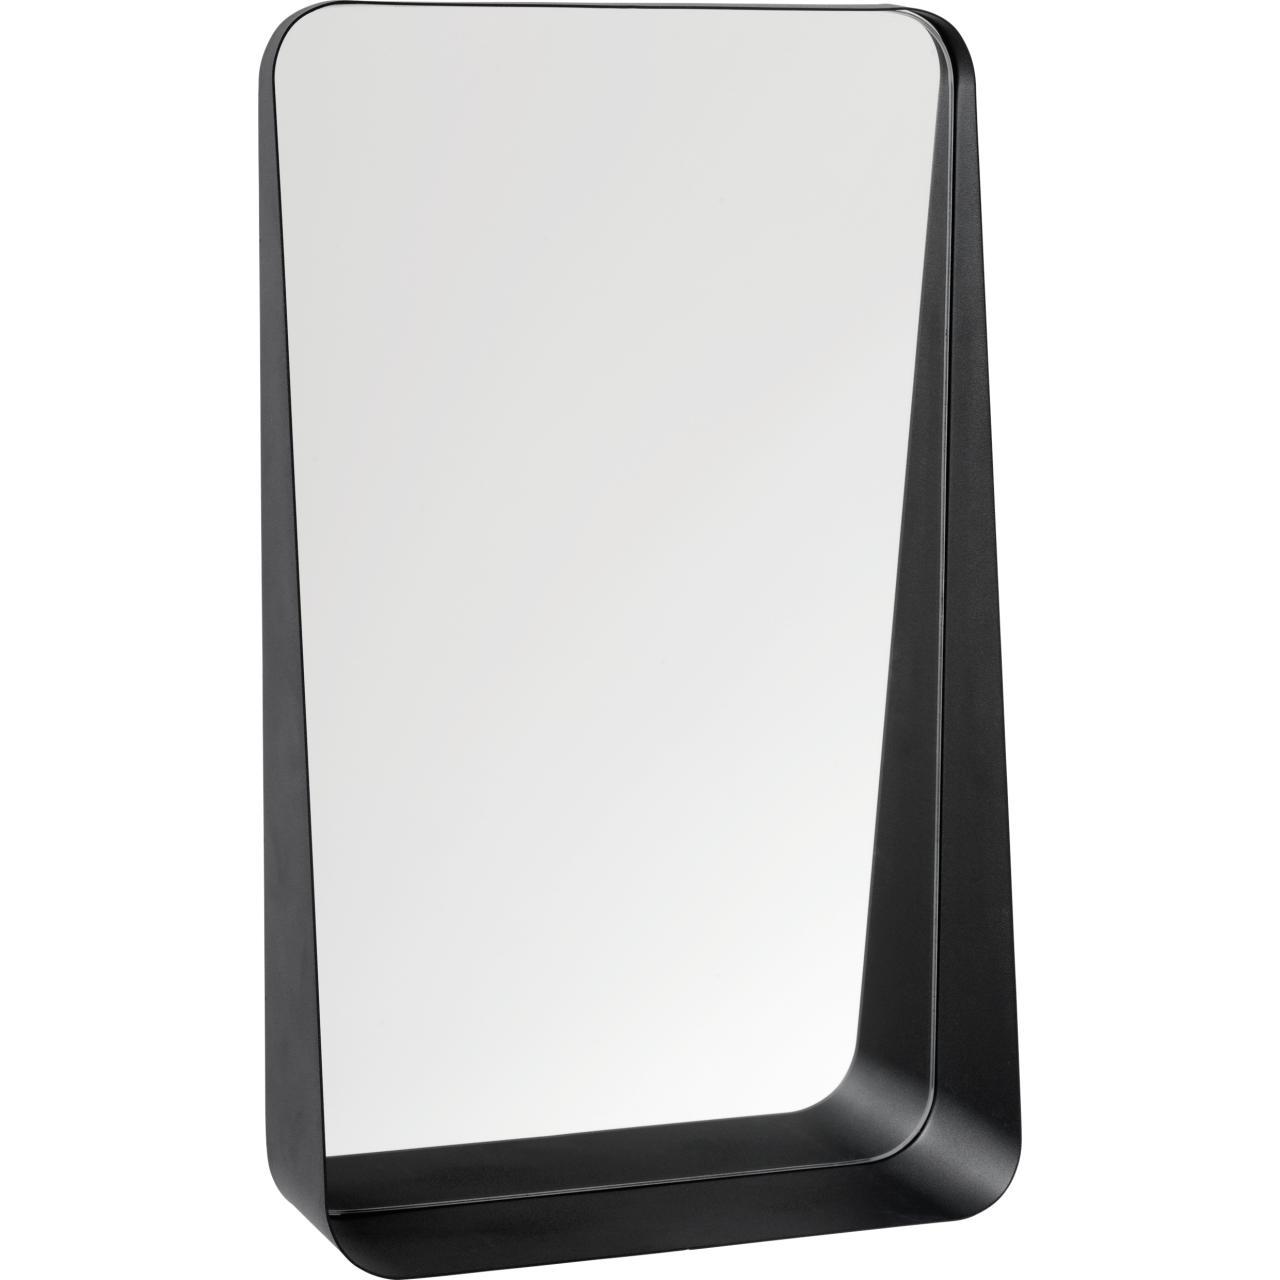 Spegel_Svart_Ram